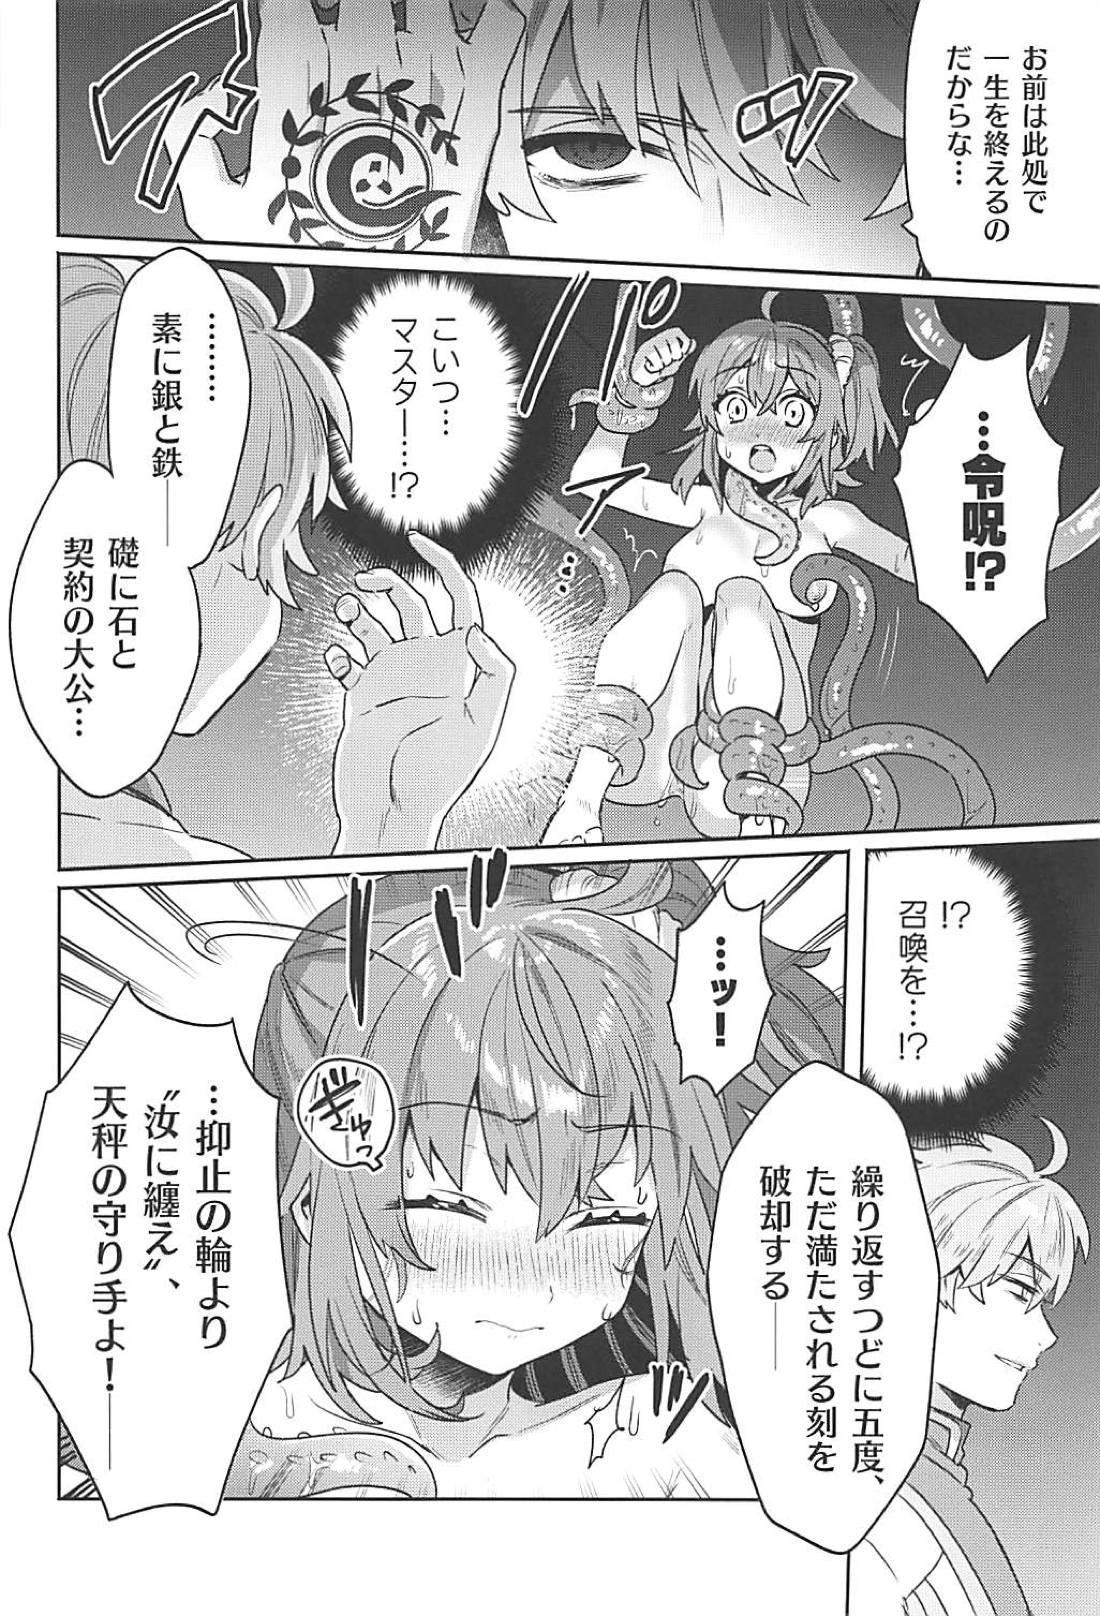 Sennou Inmon Kangoku MA/STER 8